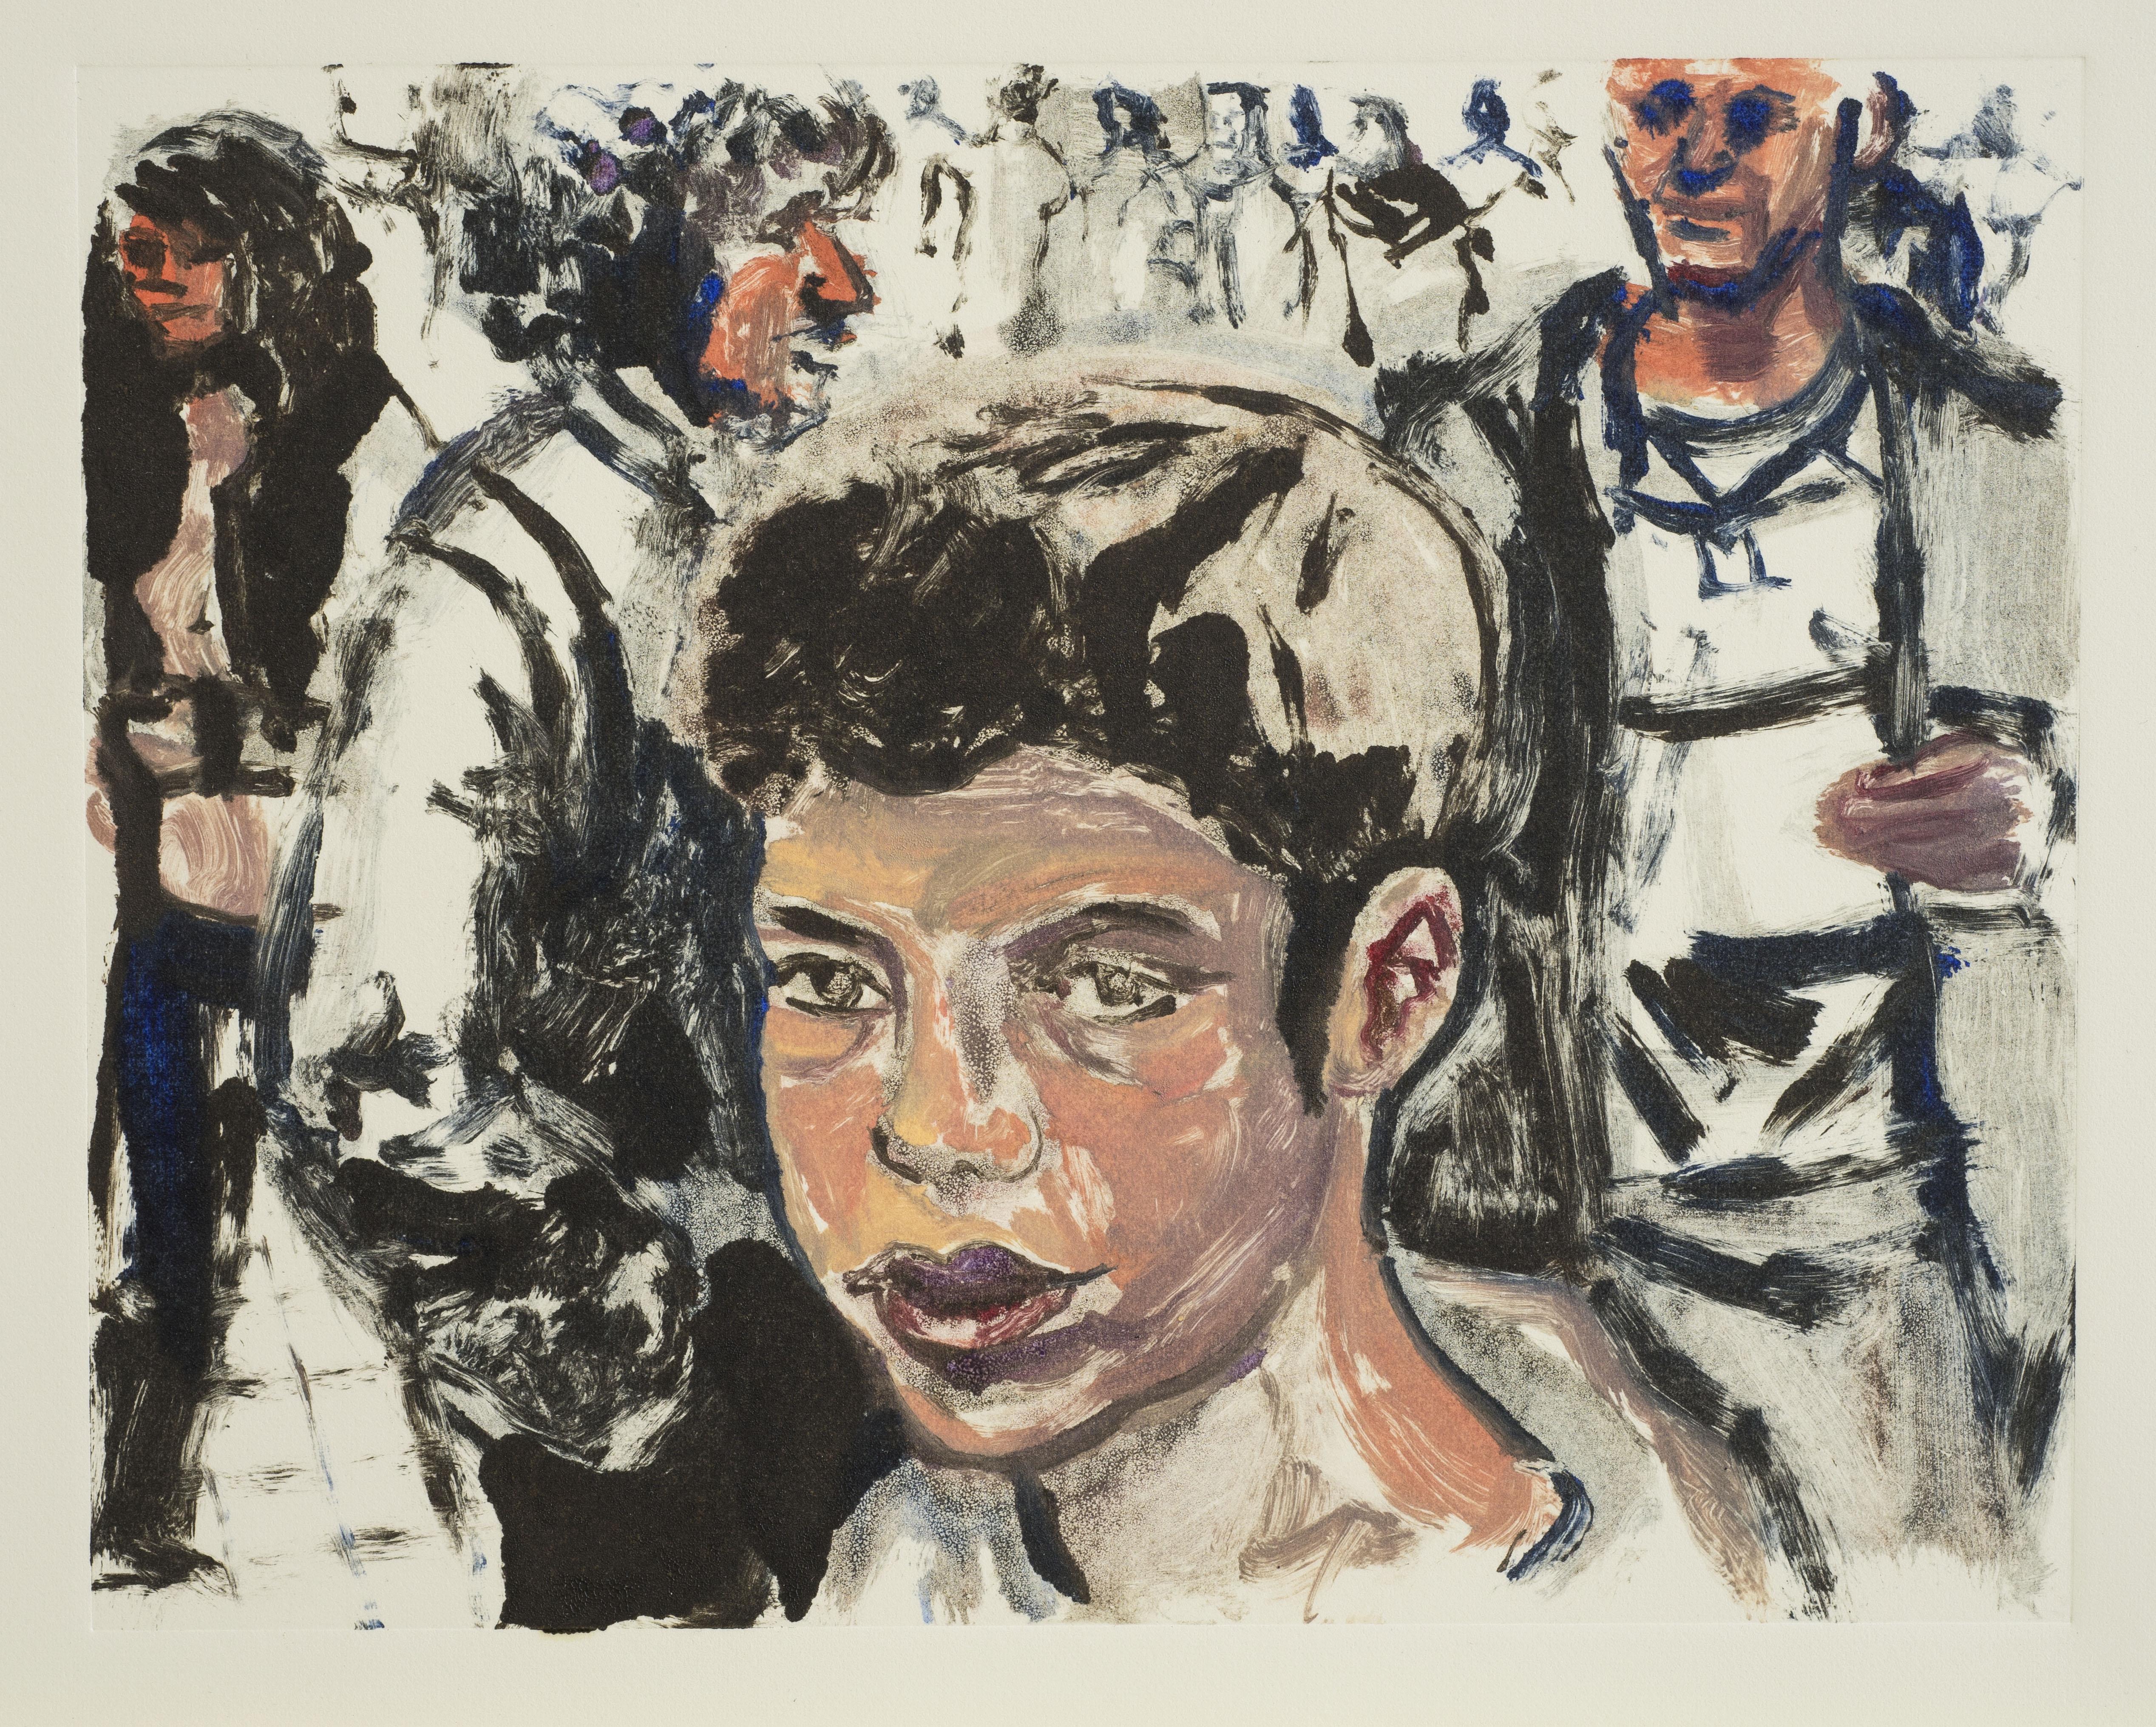 L'ado, 15x20 cm 2014